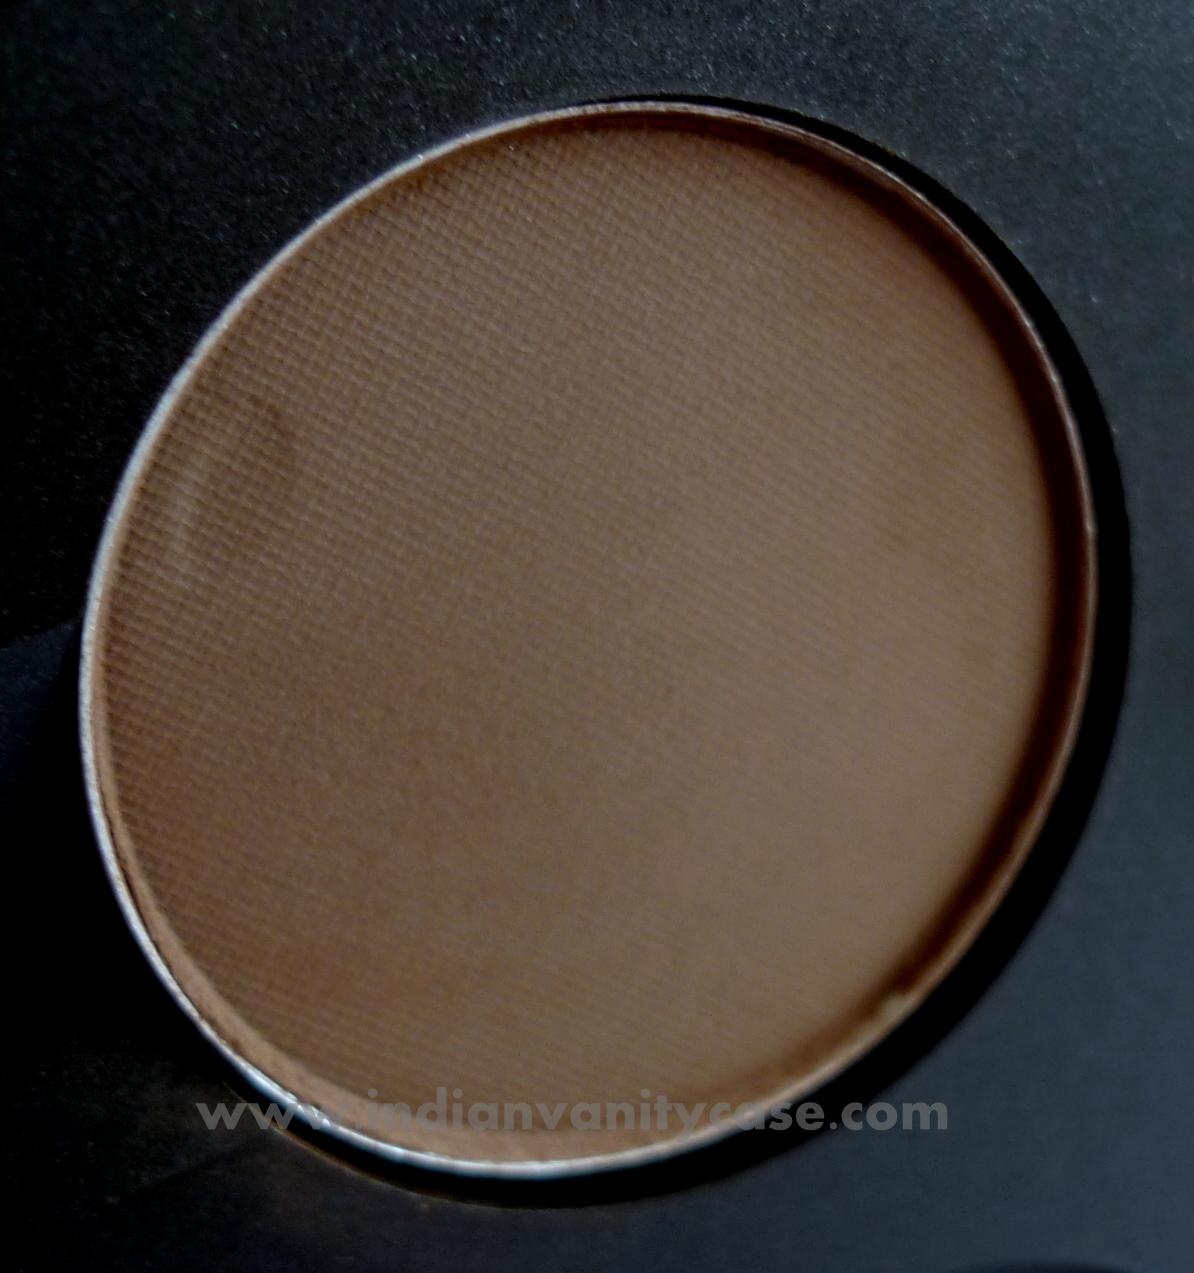 Mac casino eyeshadow review